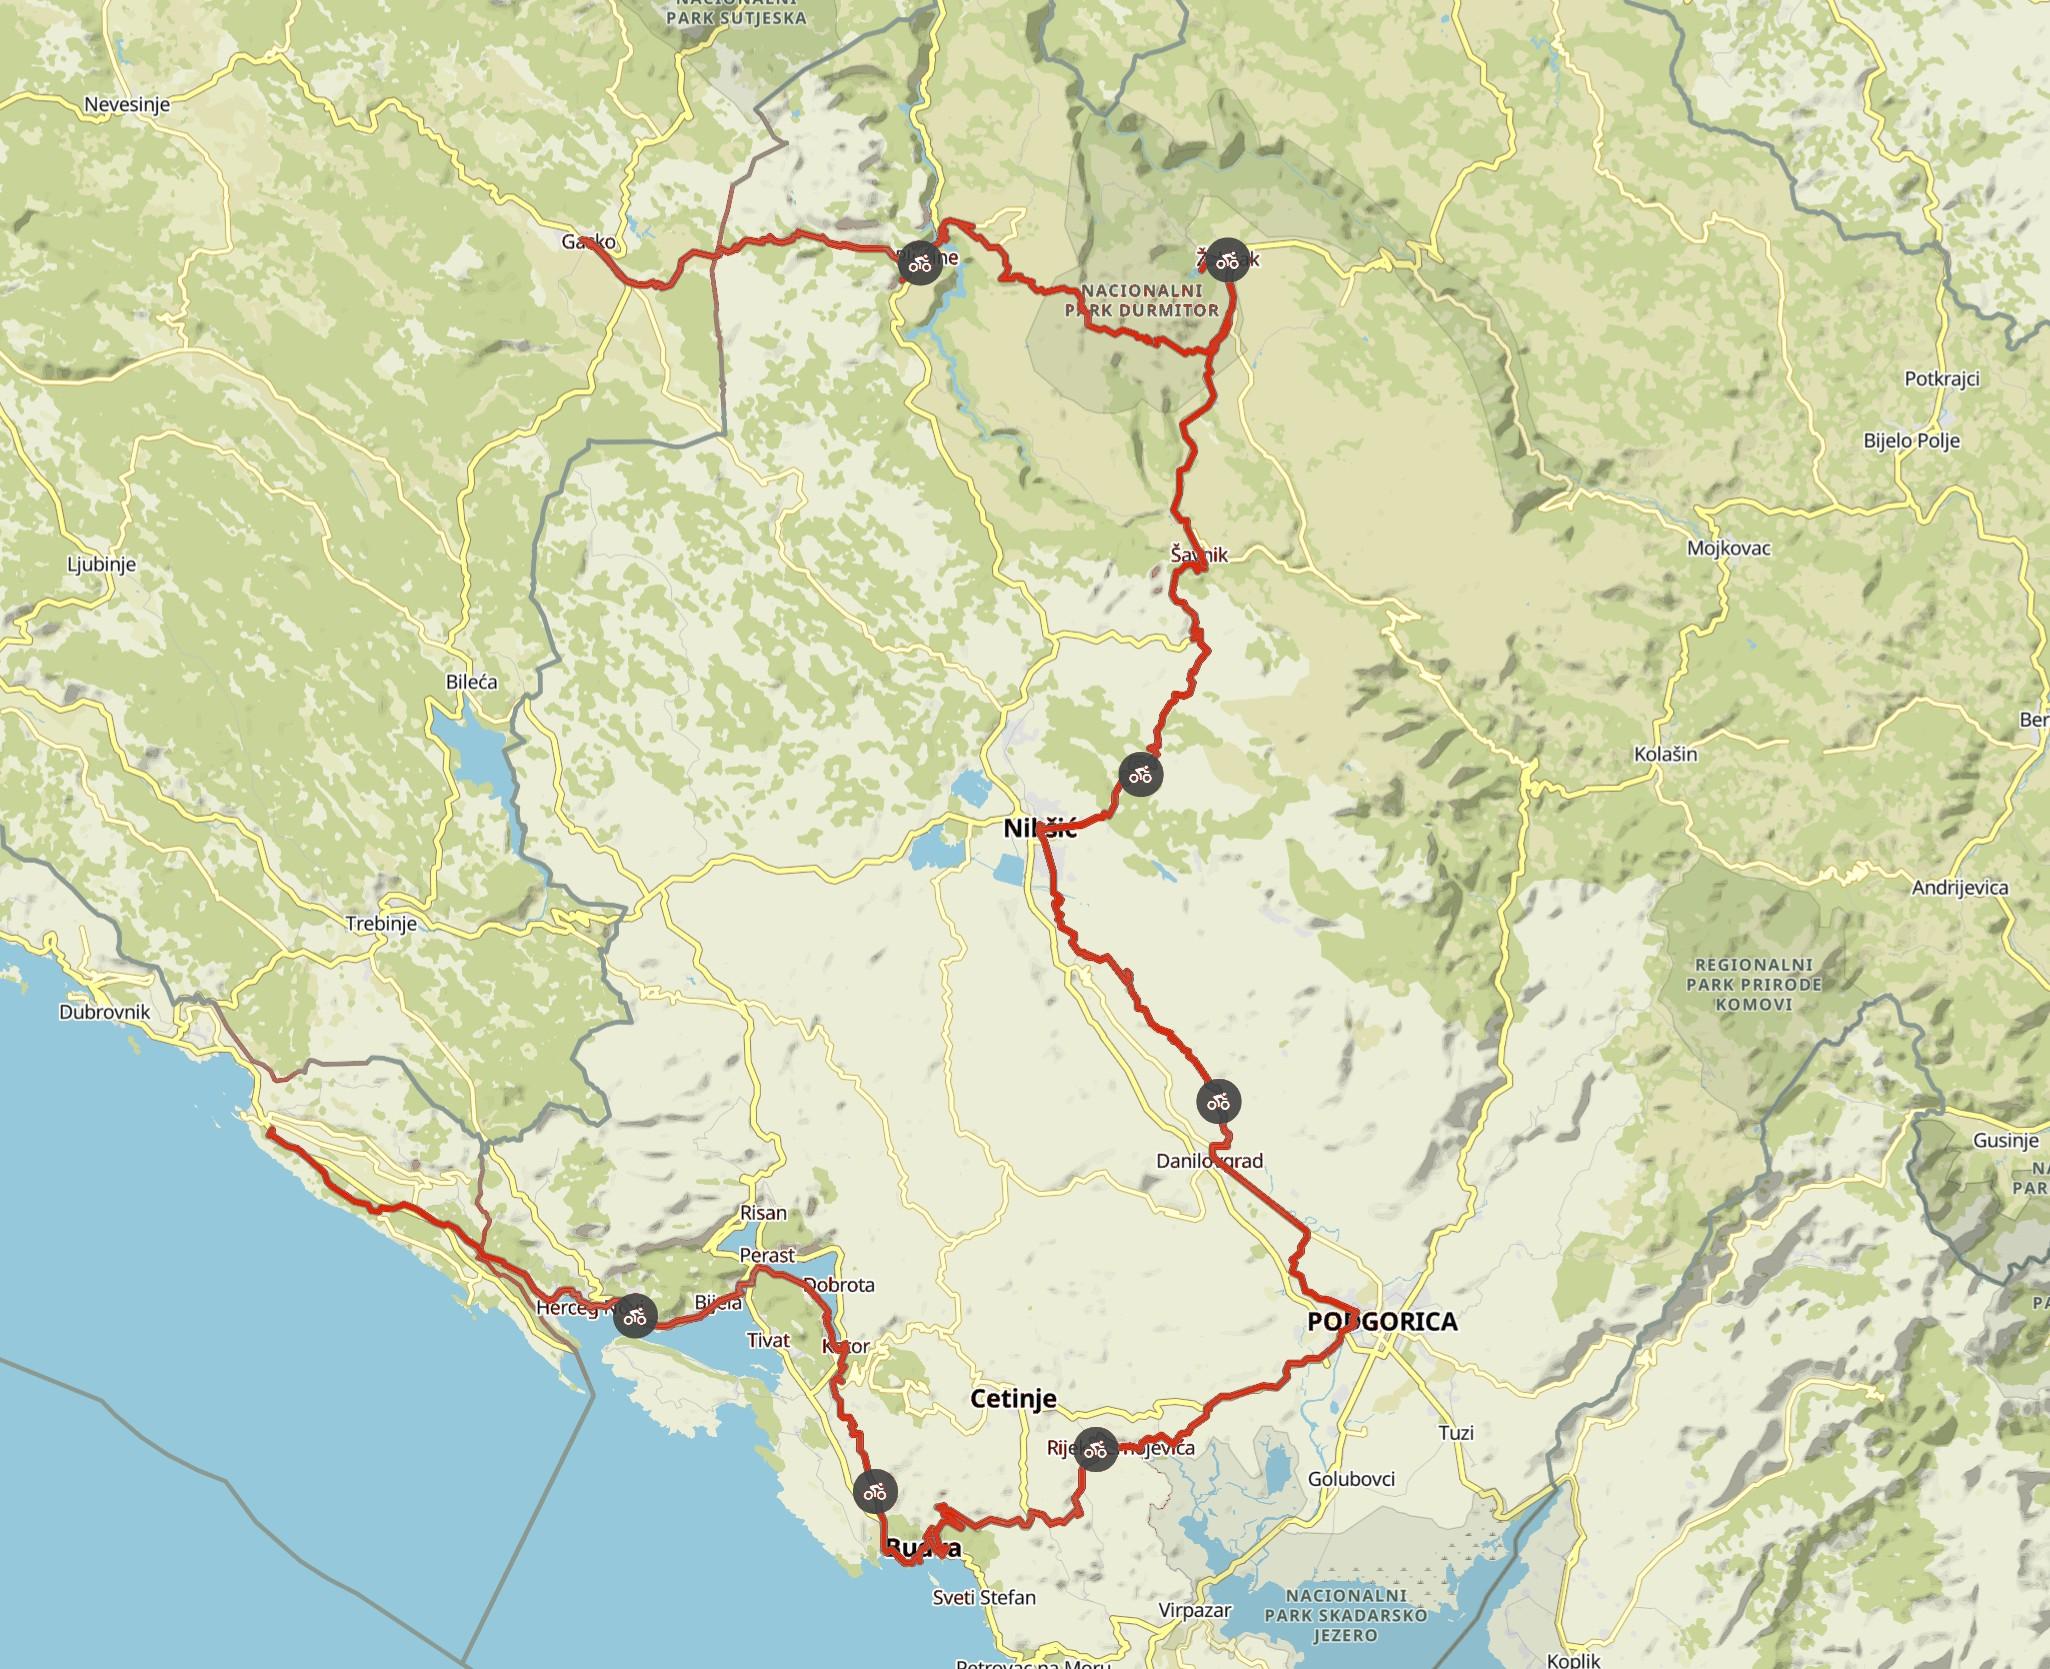 Komoot maps e-bike tour Europe with my dog 2019 – Montenegro